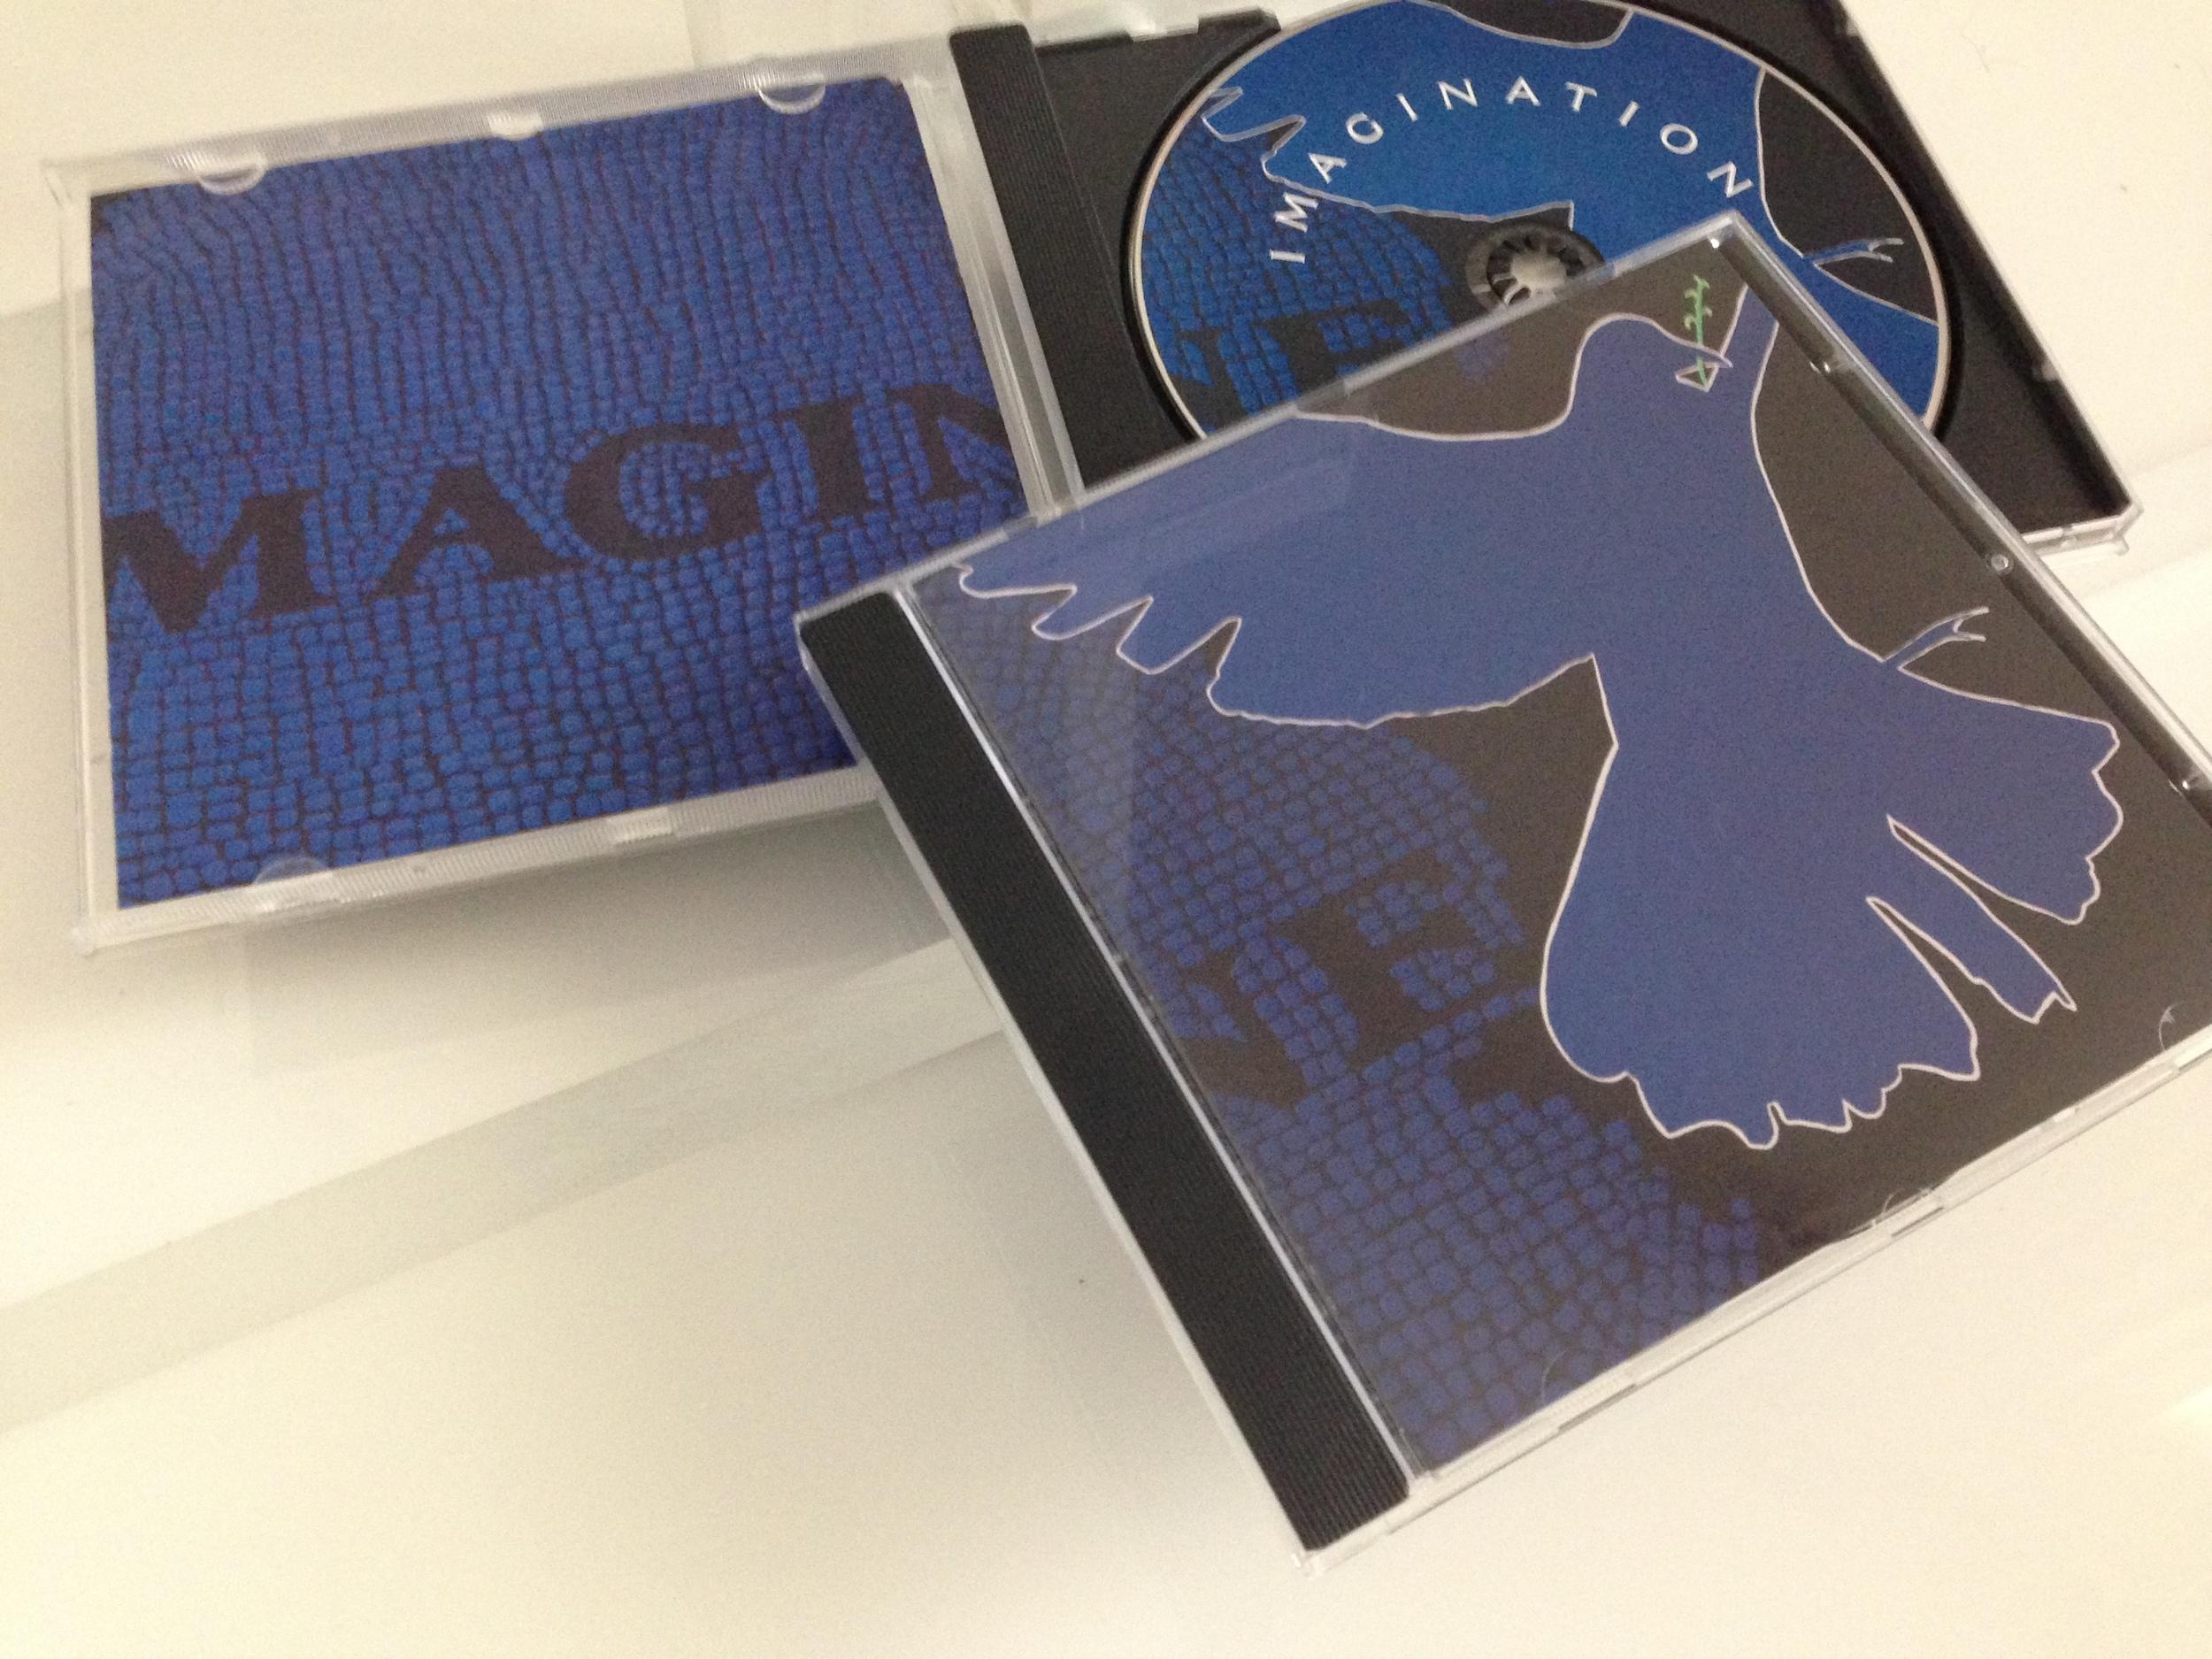 """Imagine"" used asCover Art, CD print and Booklet ArtforToco's ""Imagination"" compilation CD"